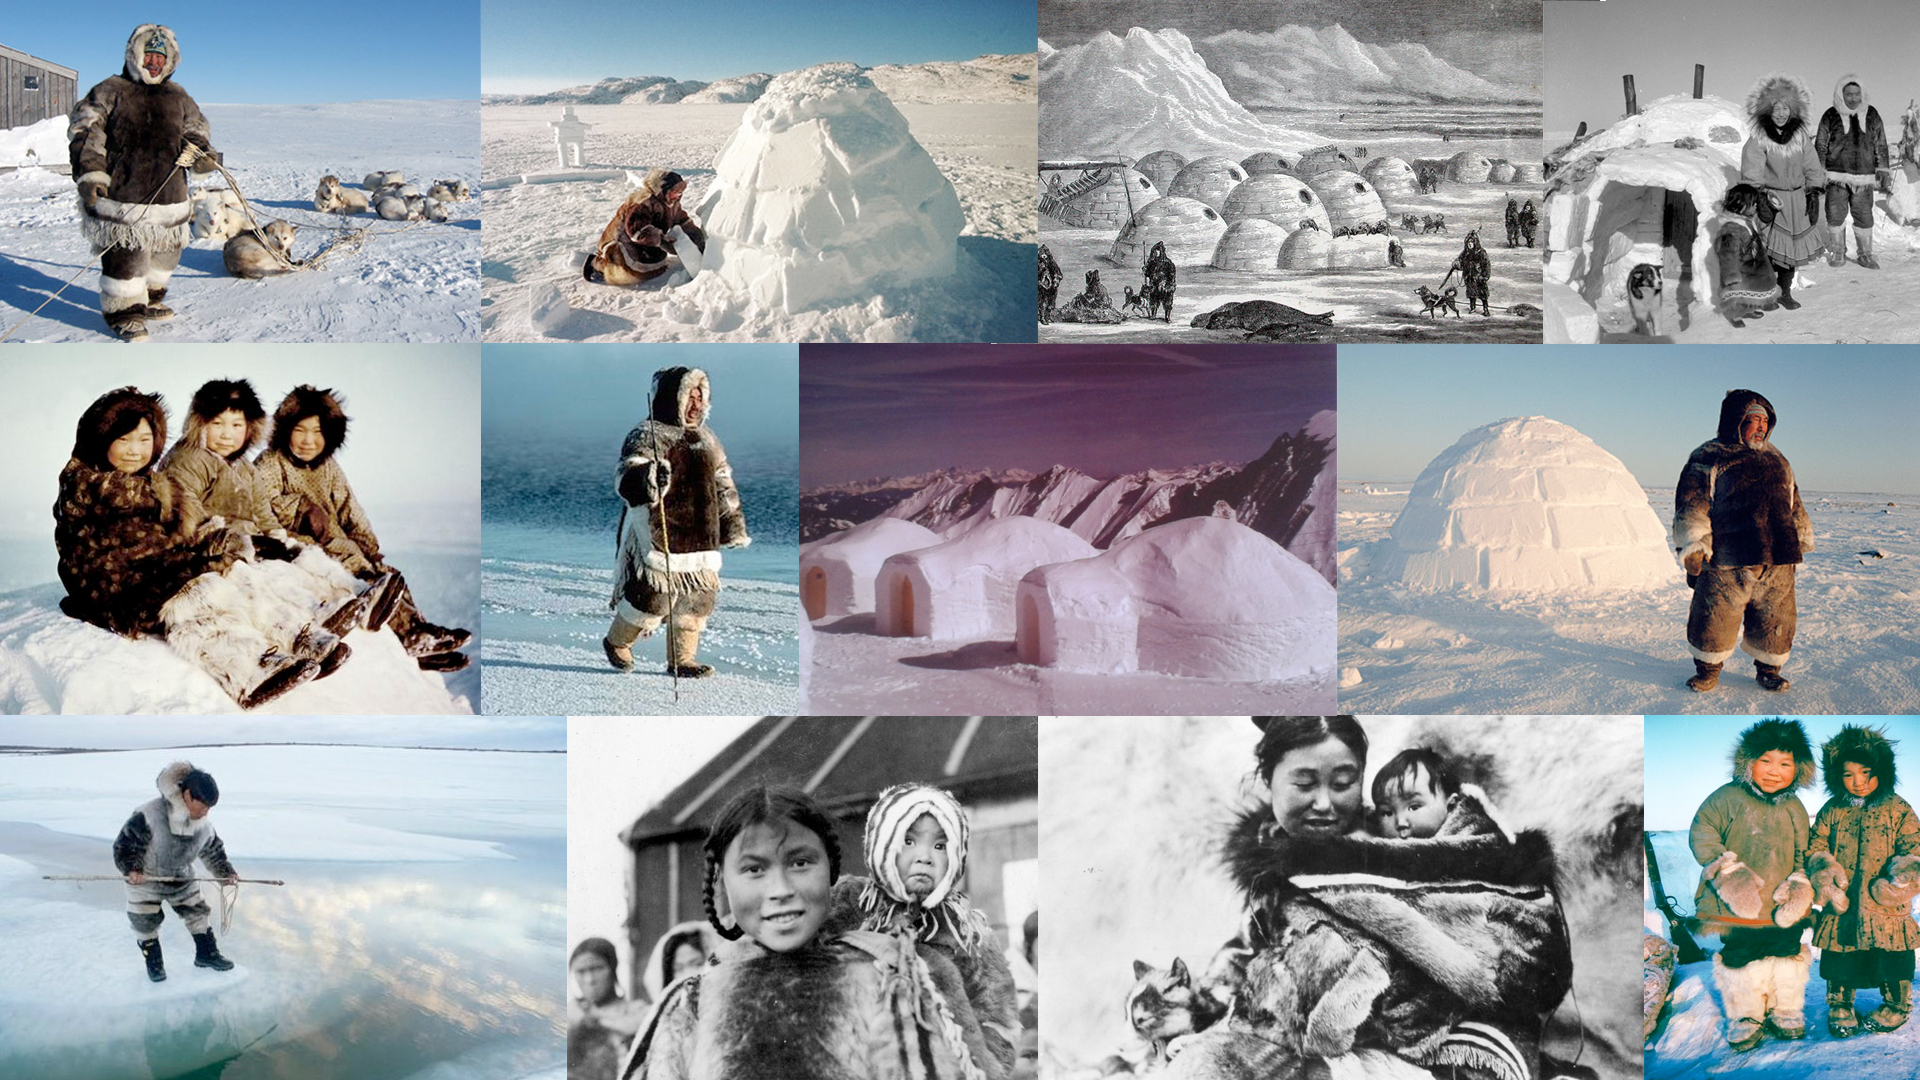 melita_inuits